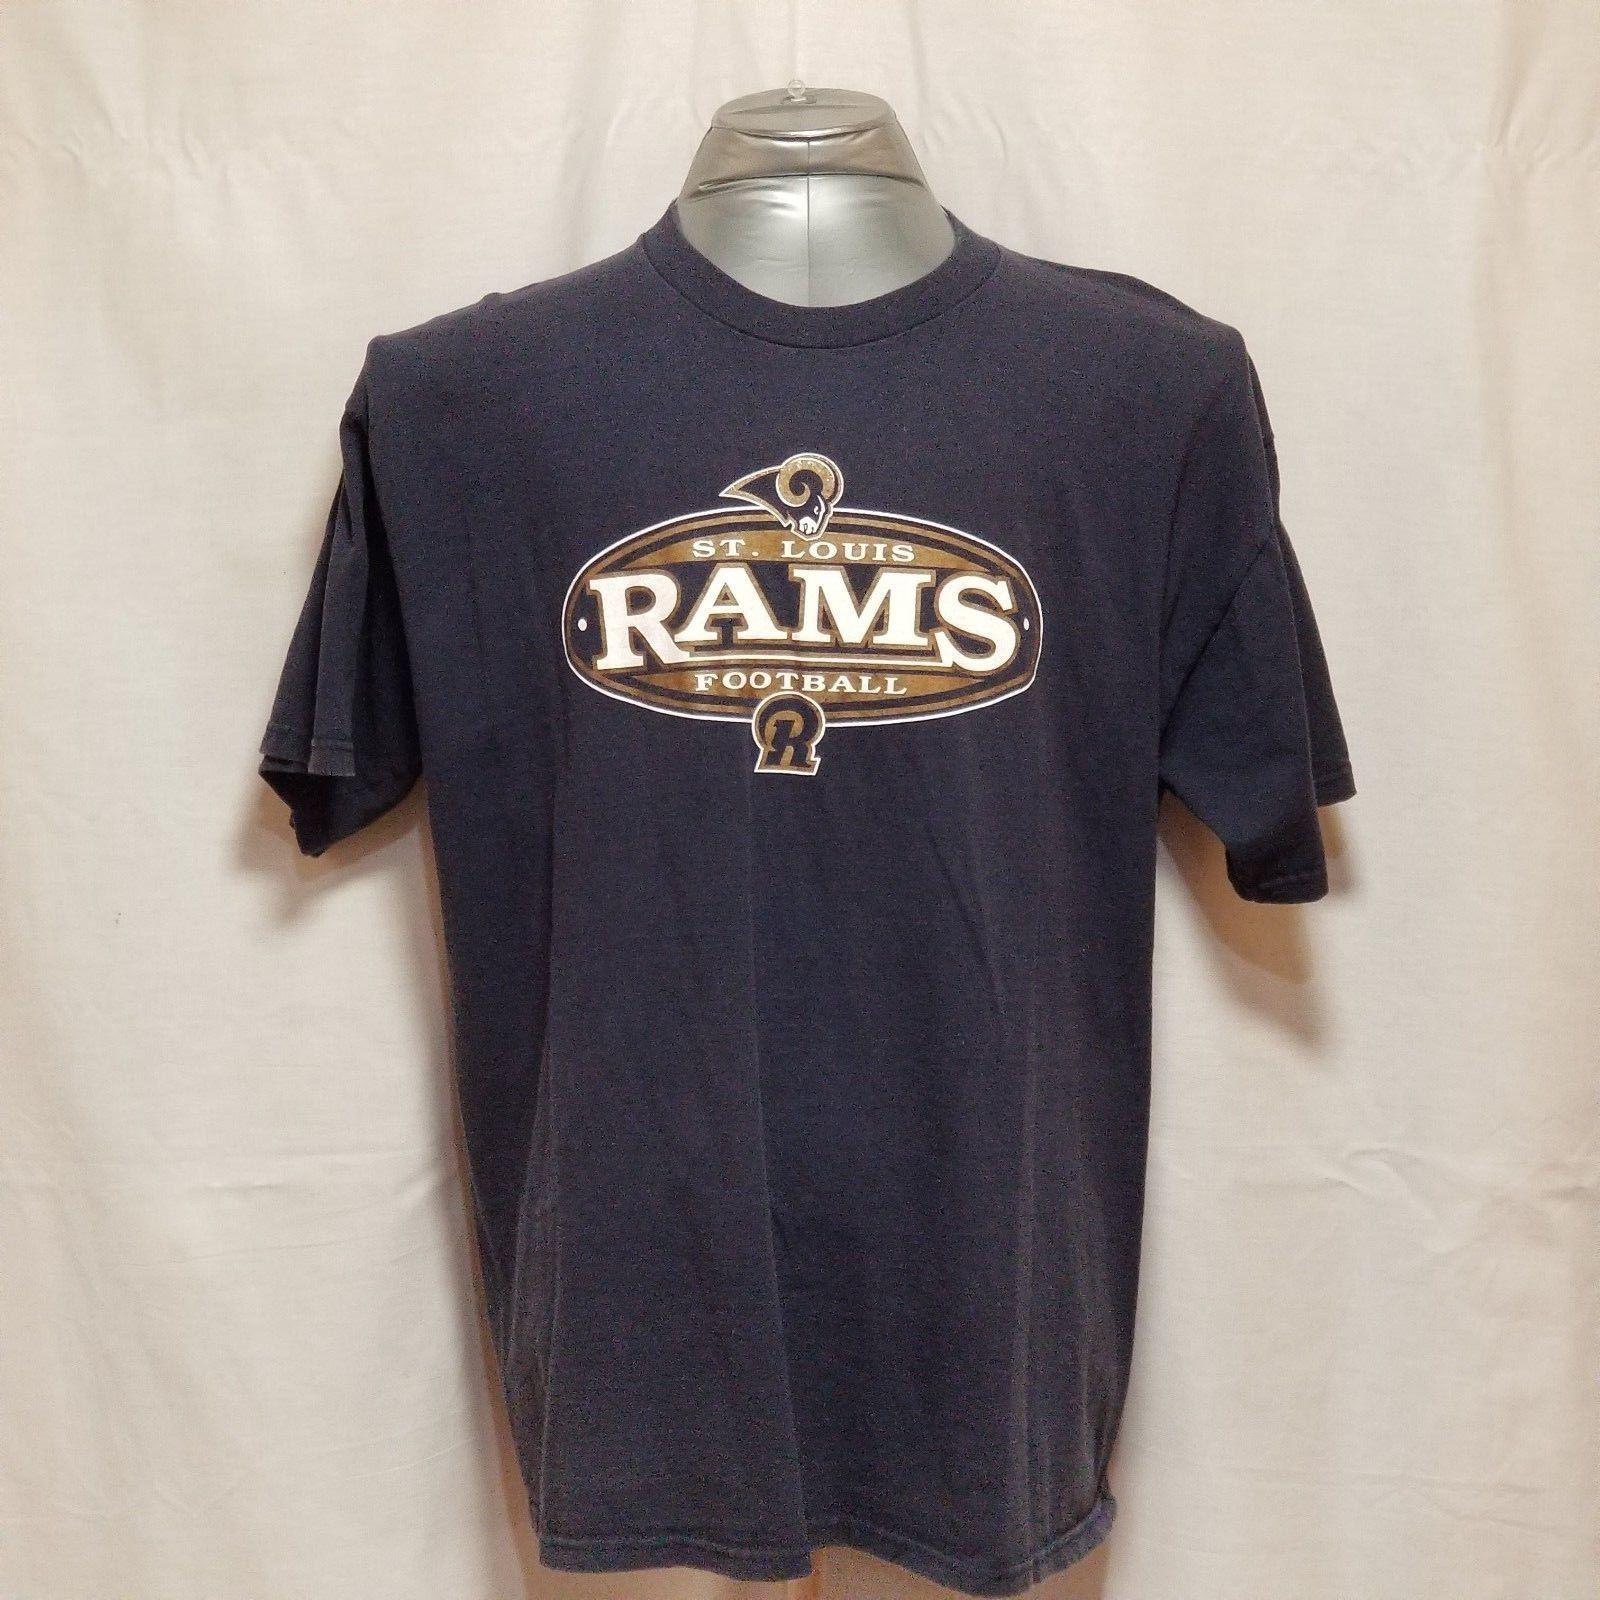 St. Louis Rams NFL Football Mens Size XL Blue Short Sleeve T Shirt